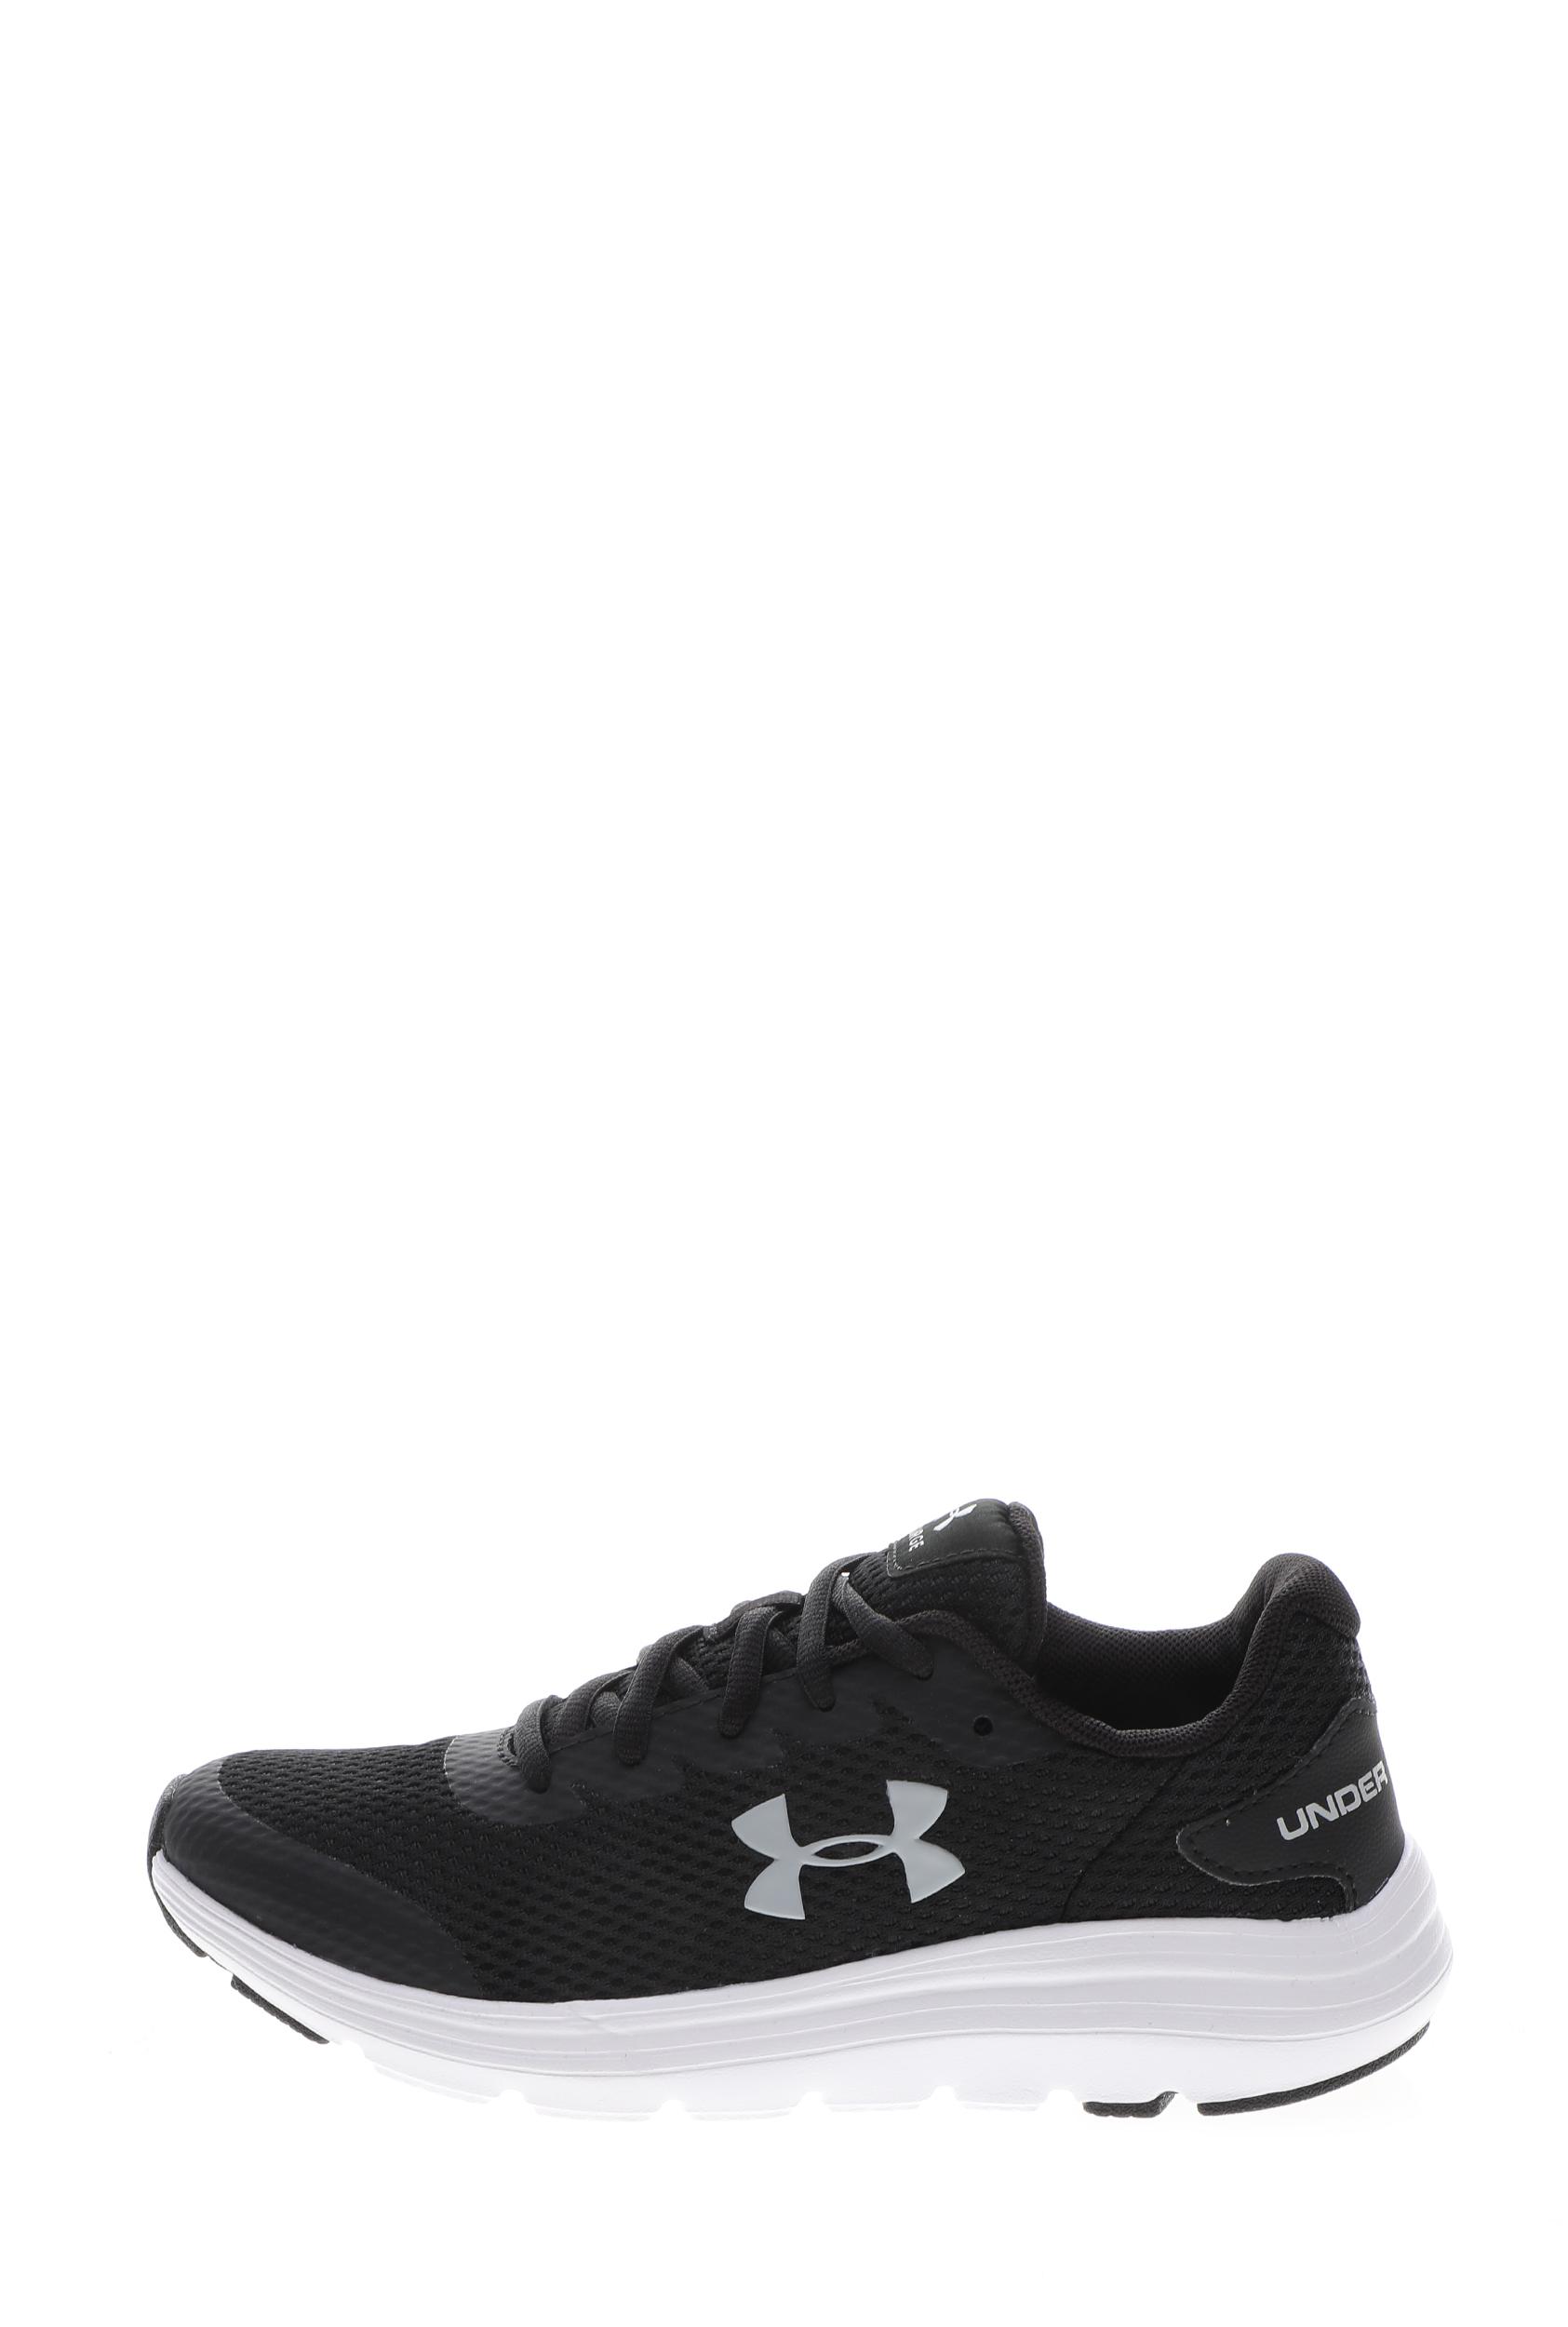 UNDER ARMOUR – Παιδικά αθλητικά παπούτσια UA GS Surge 2 μαύρα